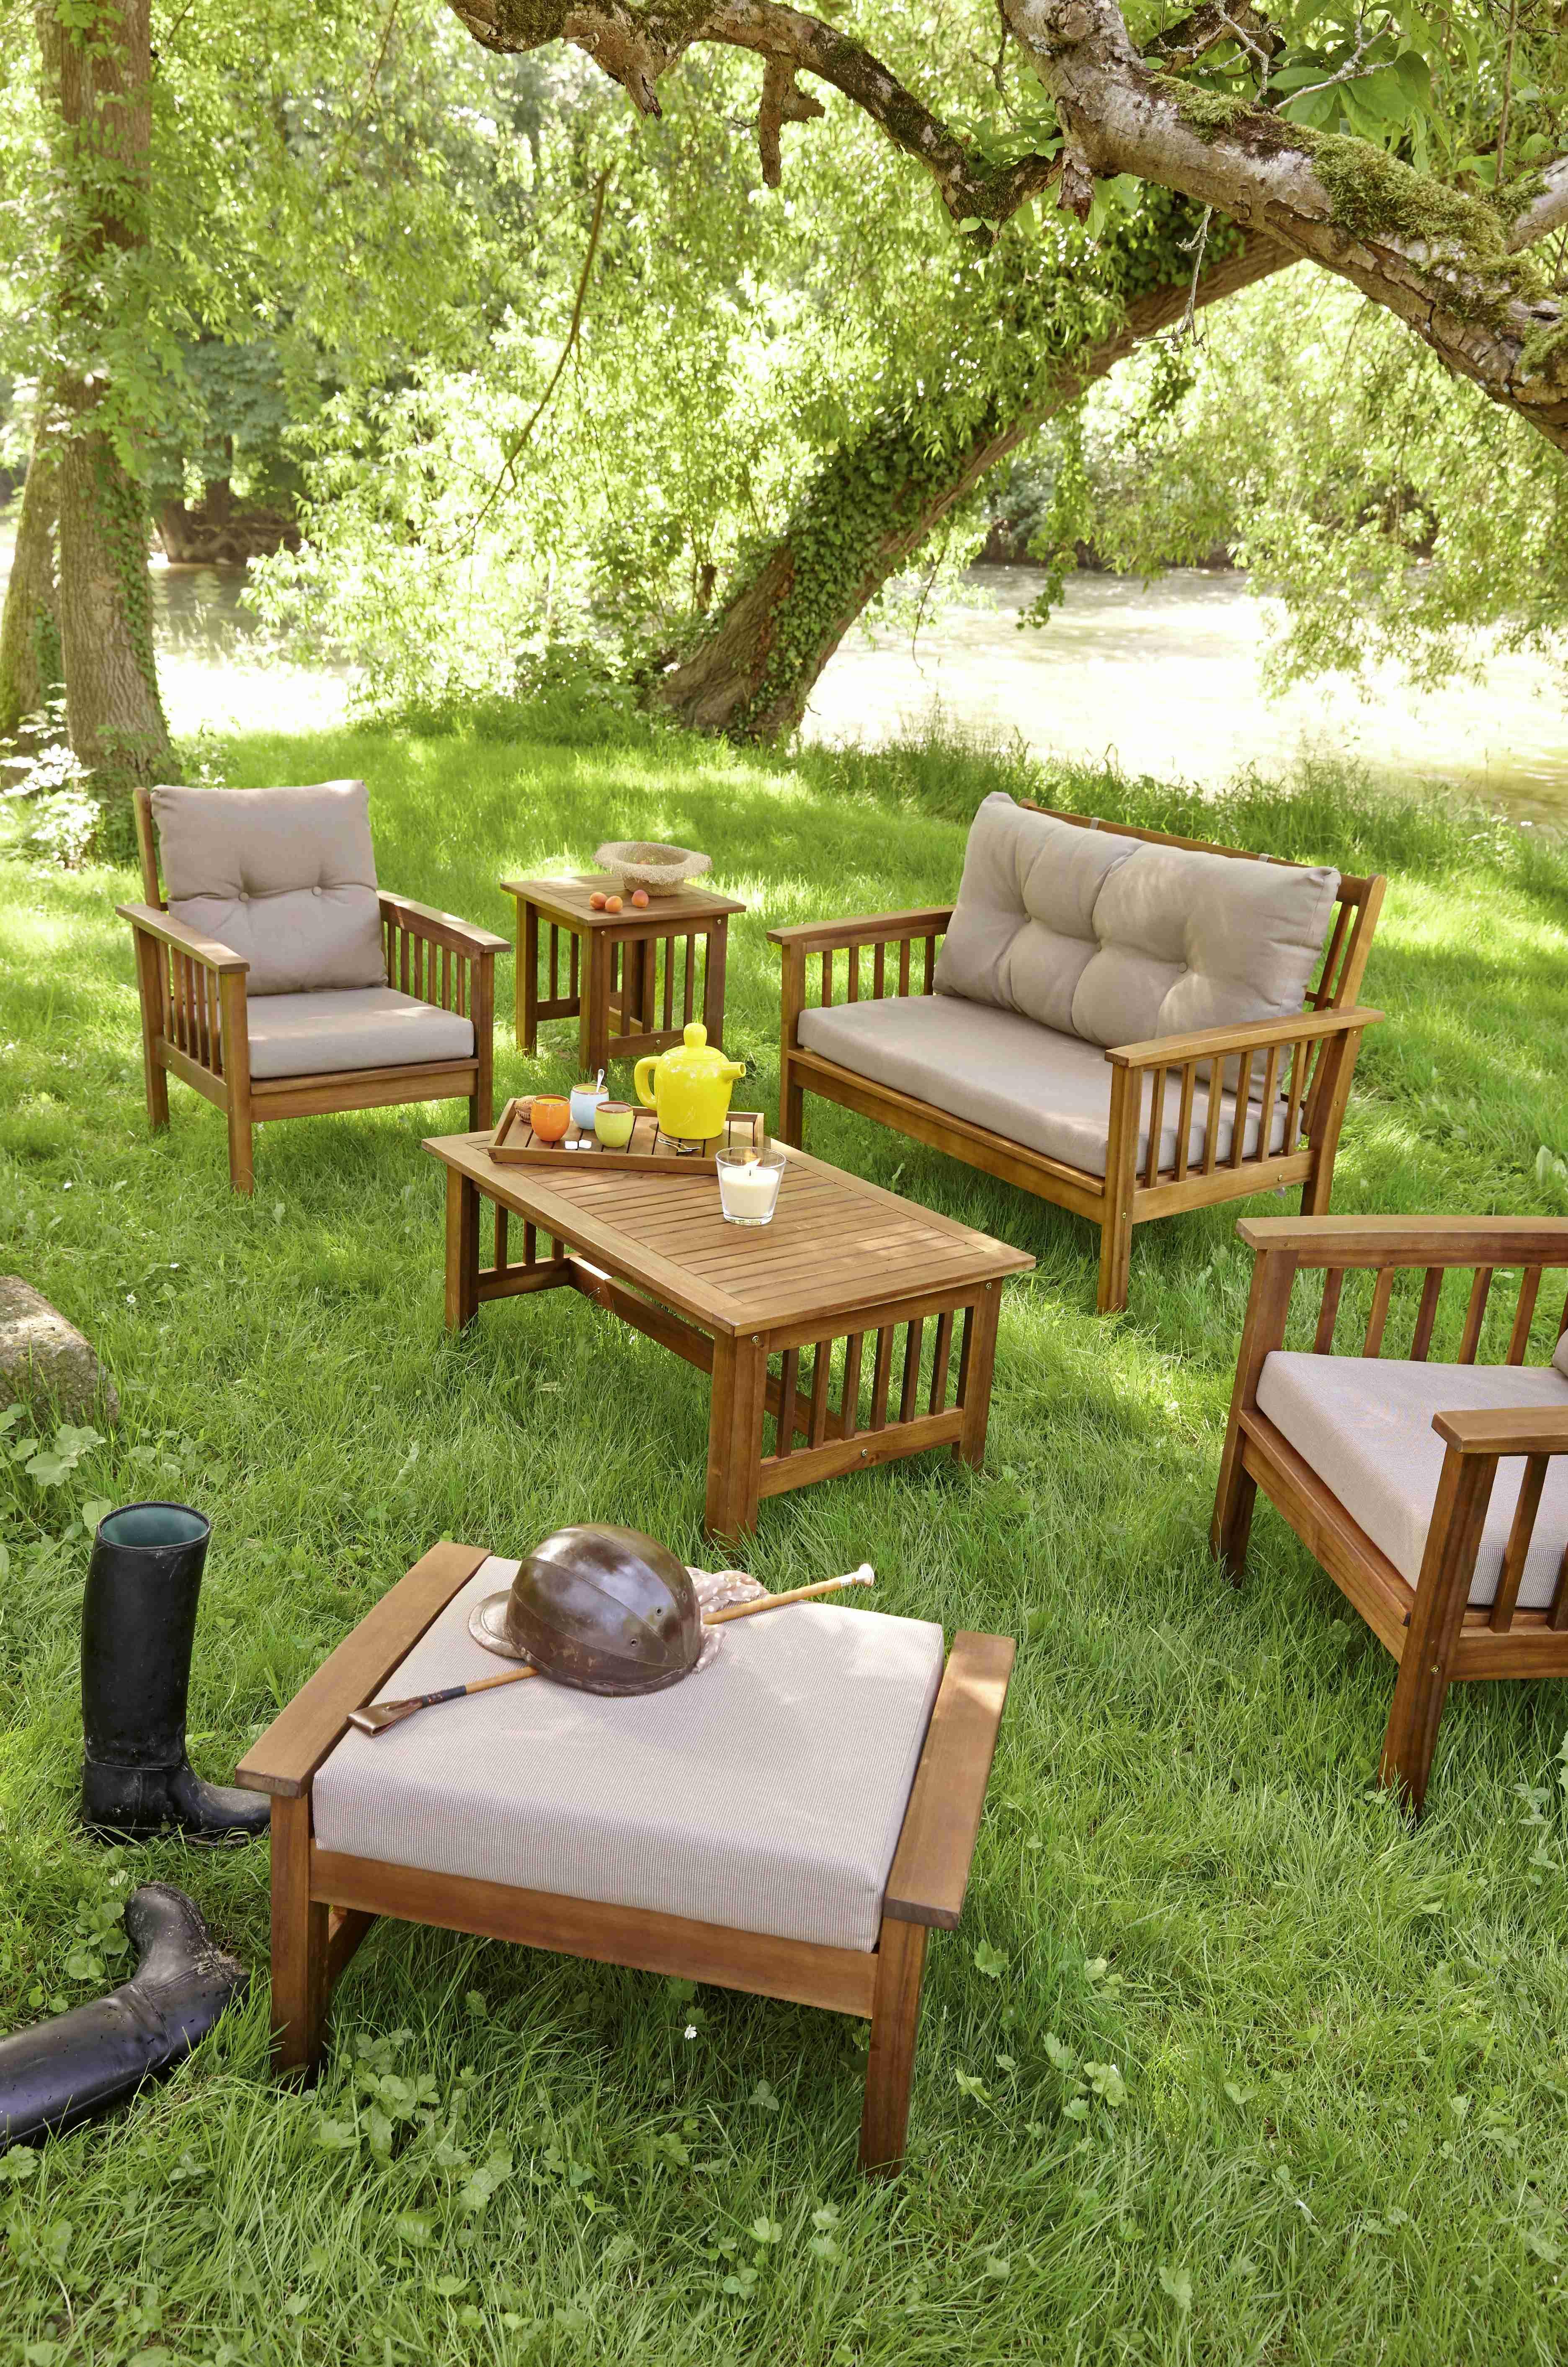 Salon de jardin en bois carrefour - Mailleraye.fr jardin